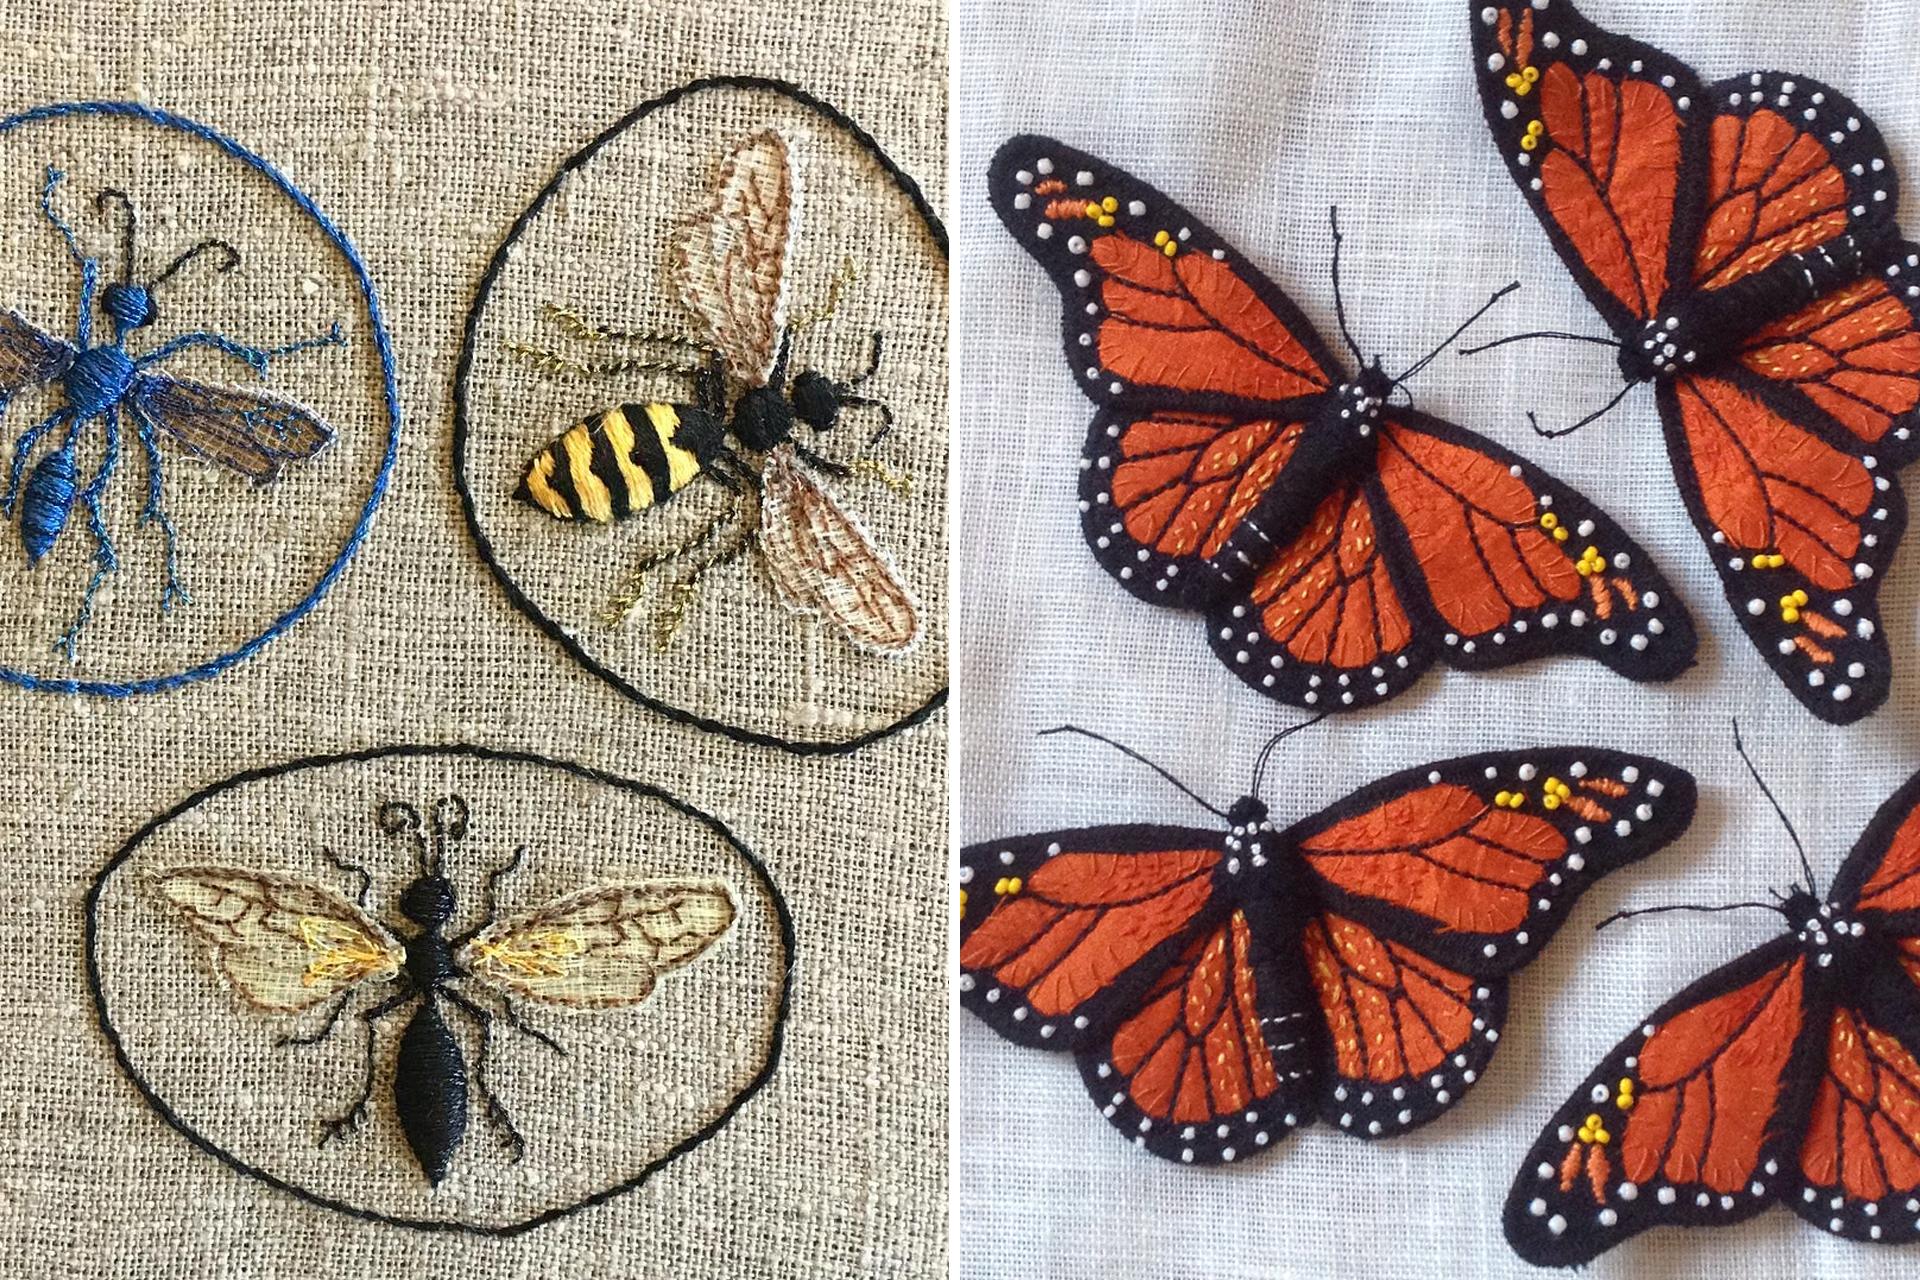 insects_blueterracotta_Koel Stories.jpg